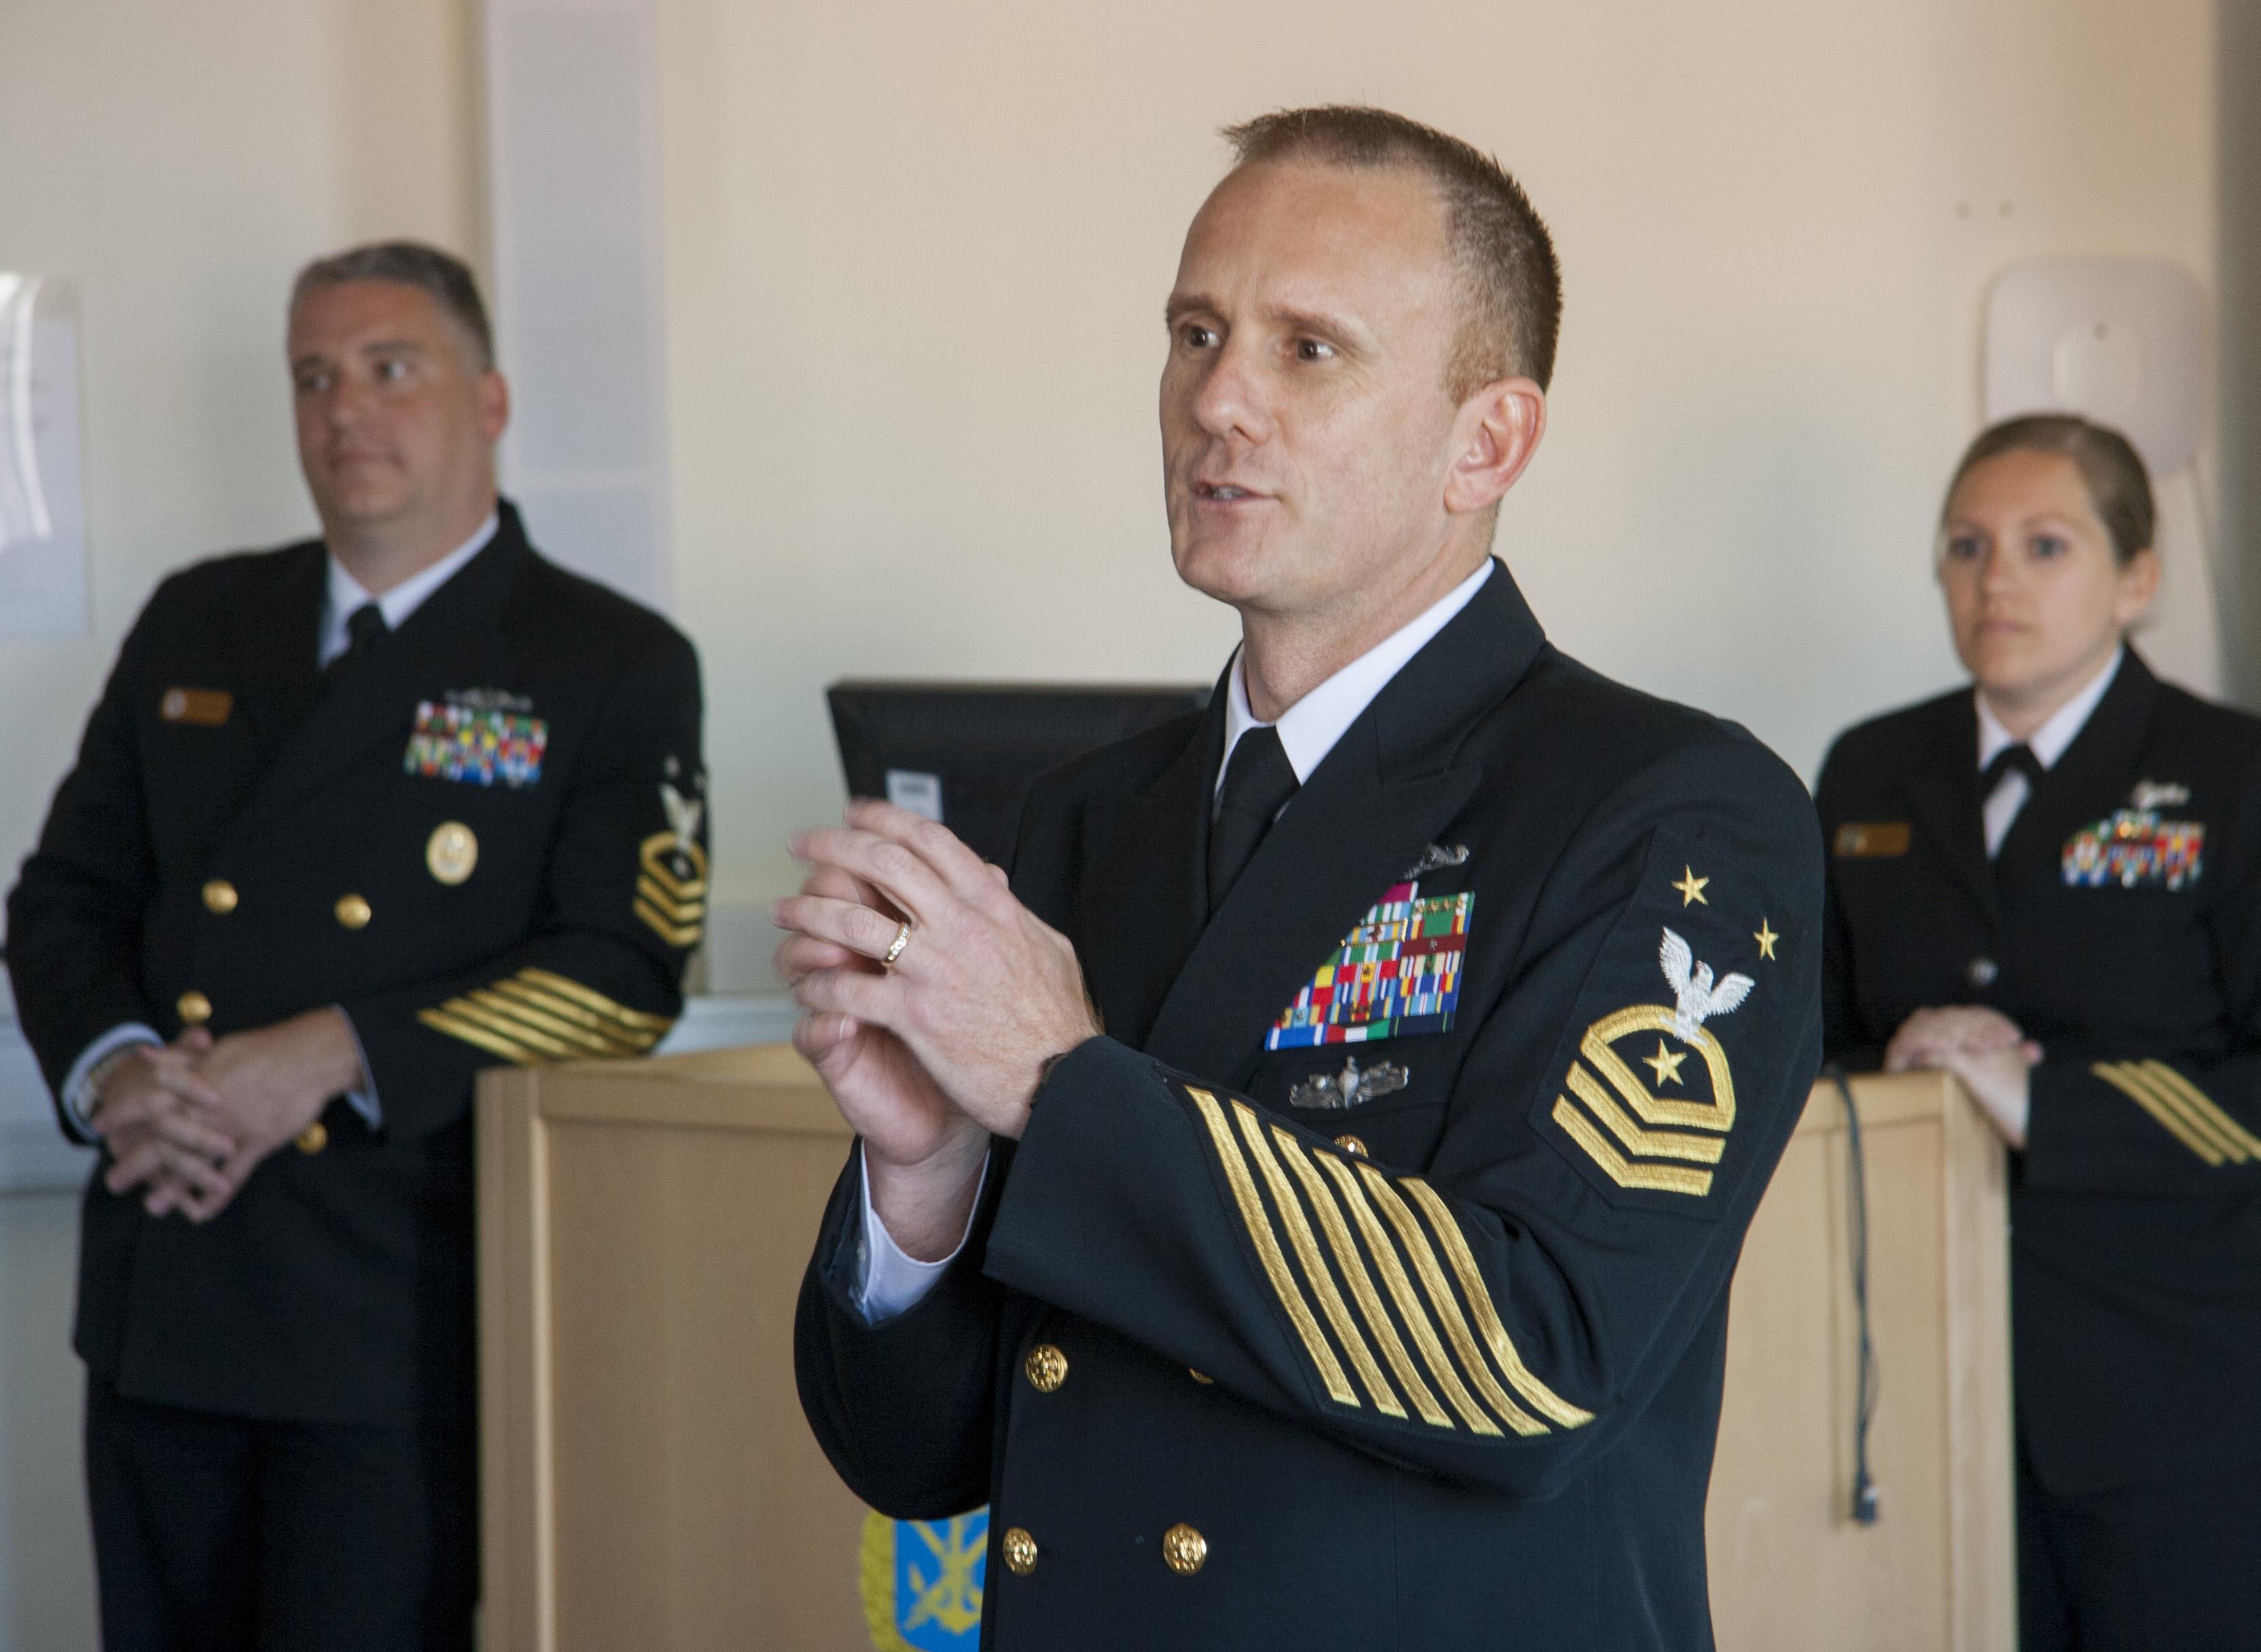 Seminarium i Trolle filmsal, Fleet Master Chief Steven S. Giordano